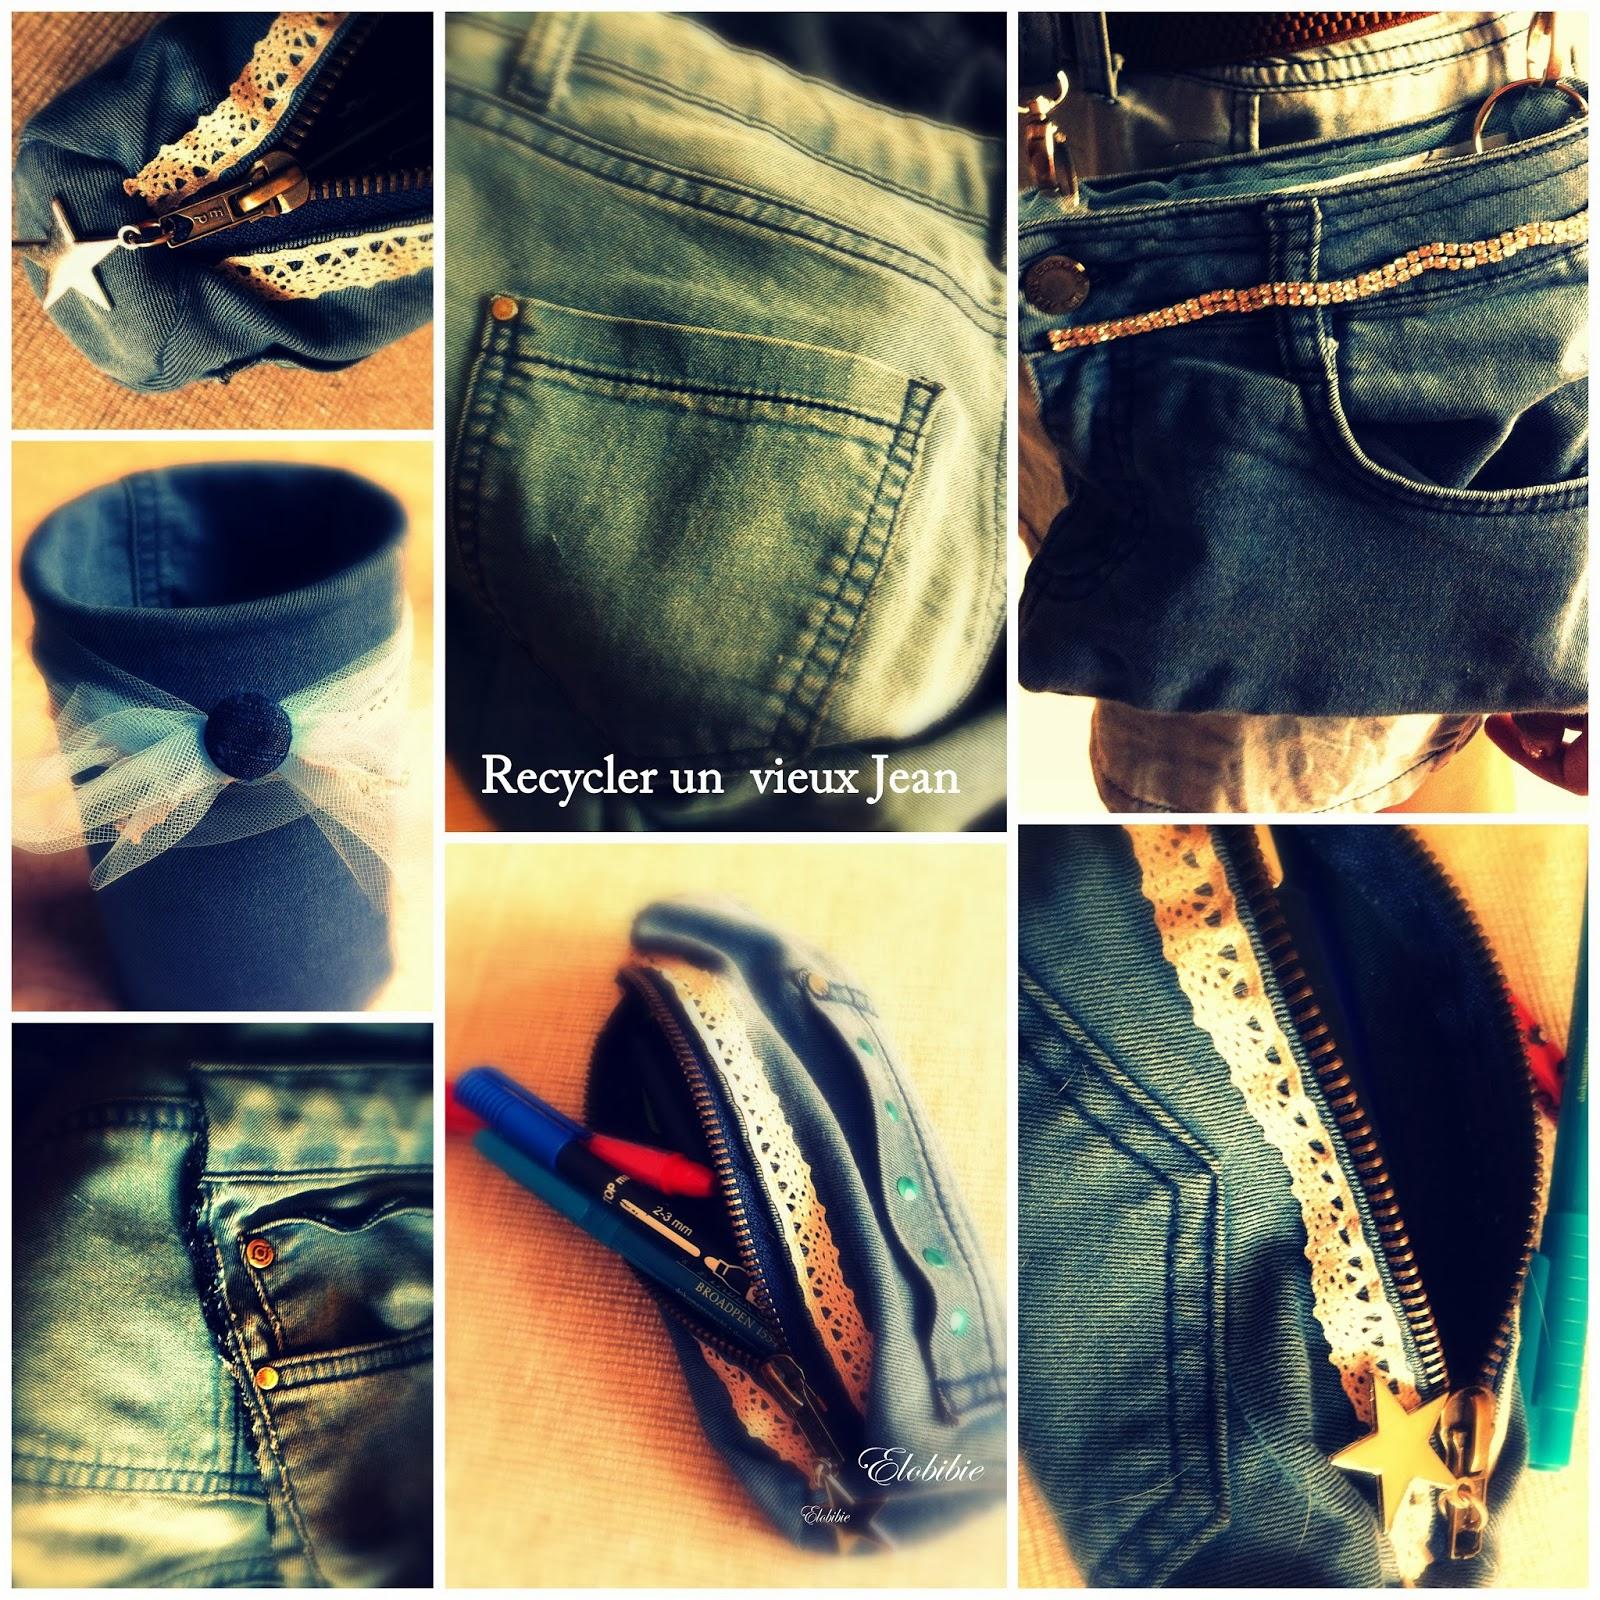 elobibilaf e recycler un vieux jeans. Black Bedroom Furniture Sets. Home Design Ideas